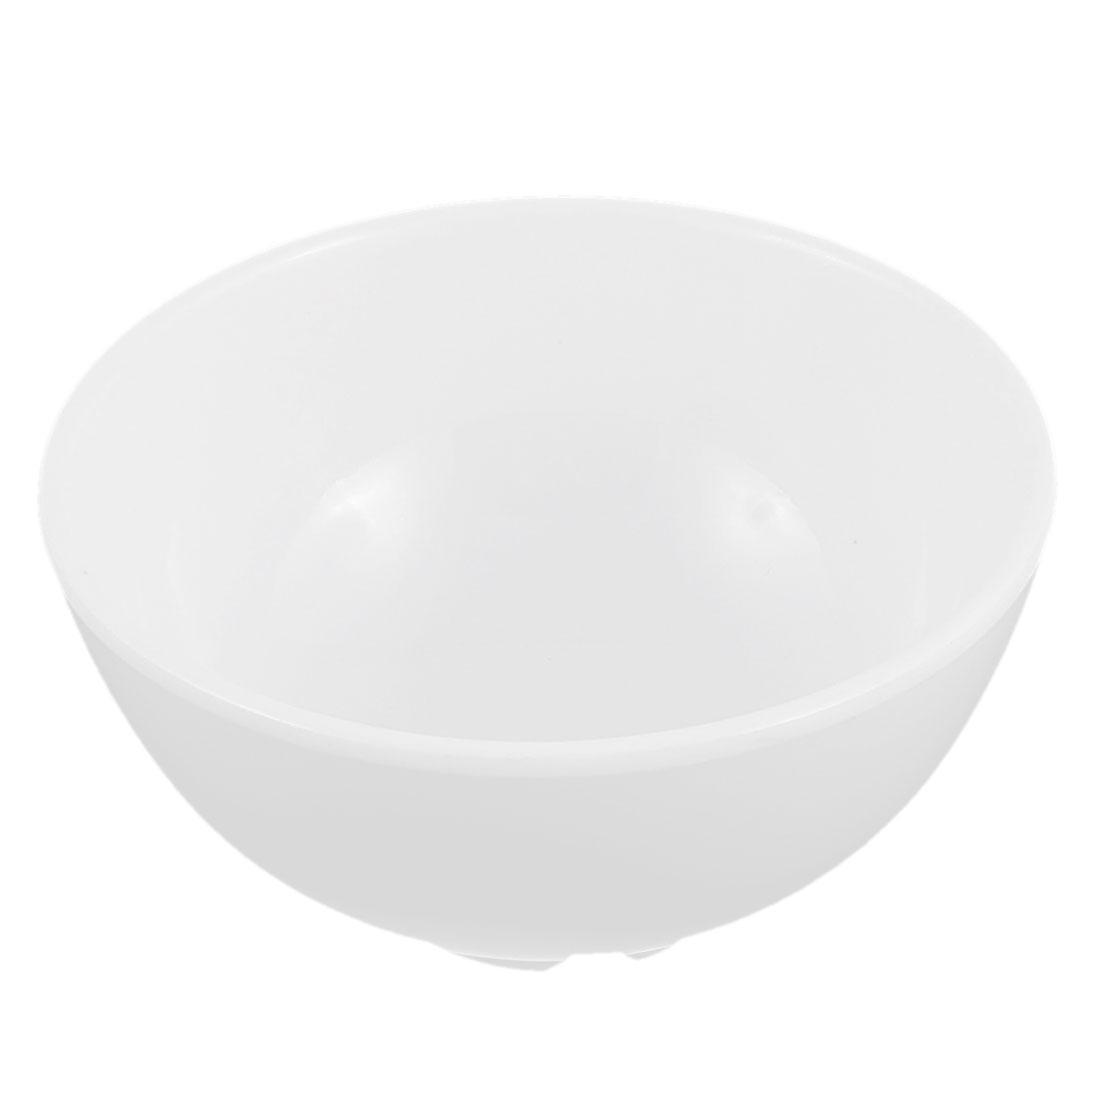 Porridge Rice Bowl Food Holder Container White